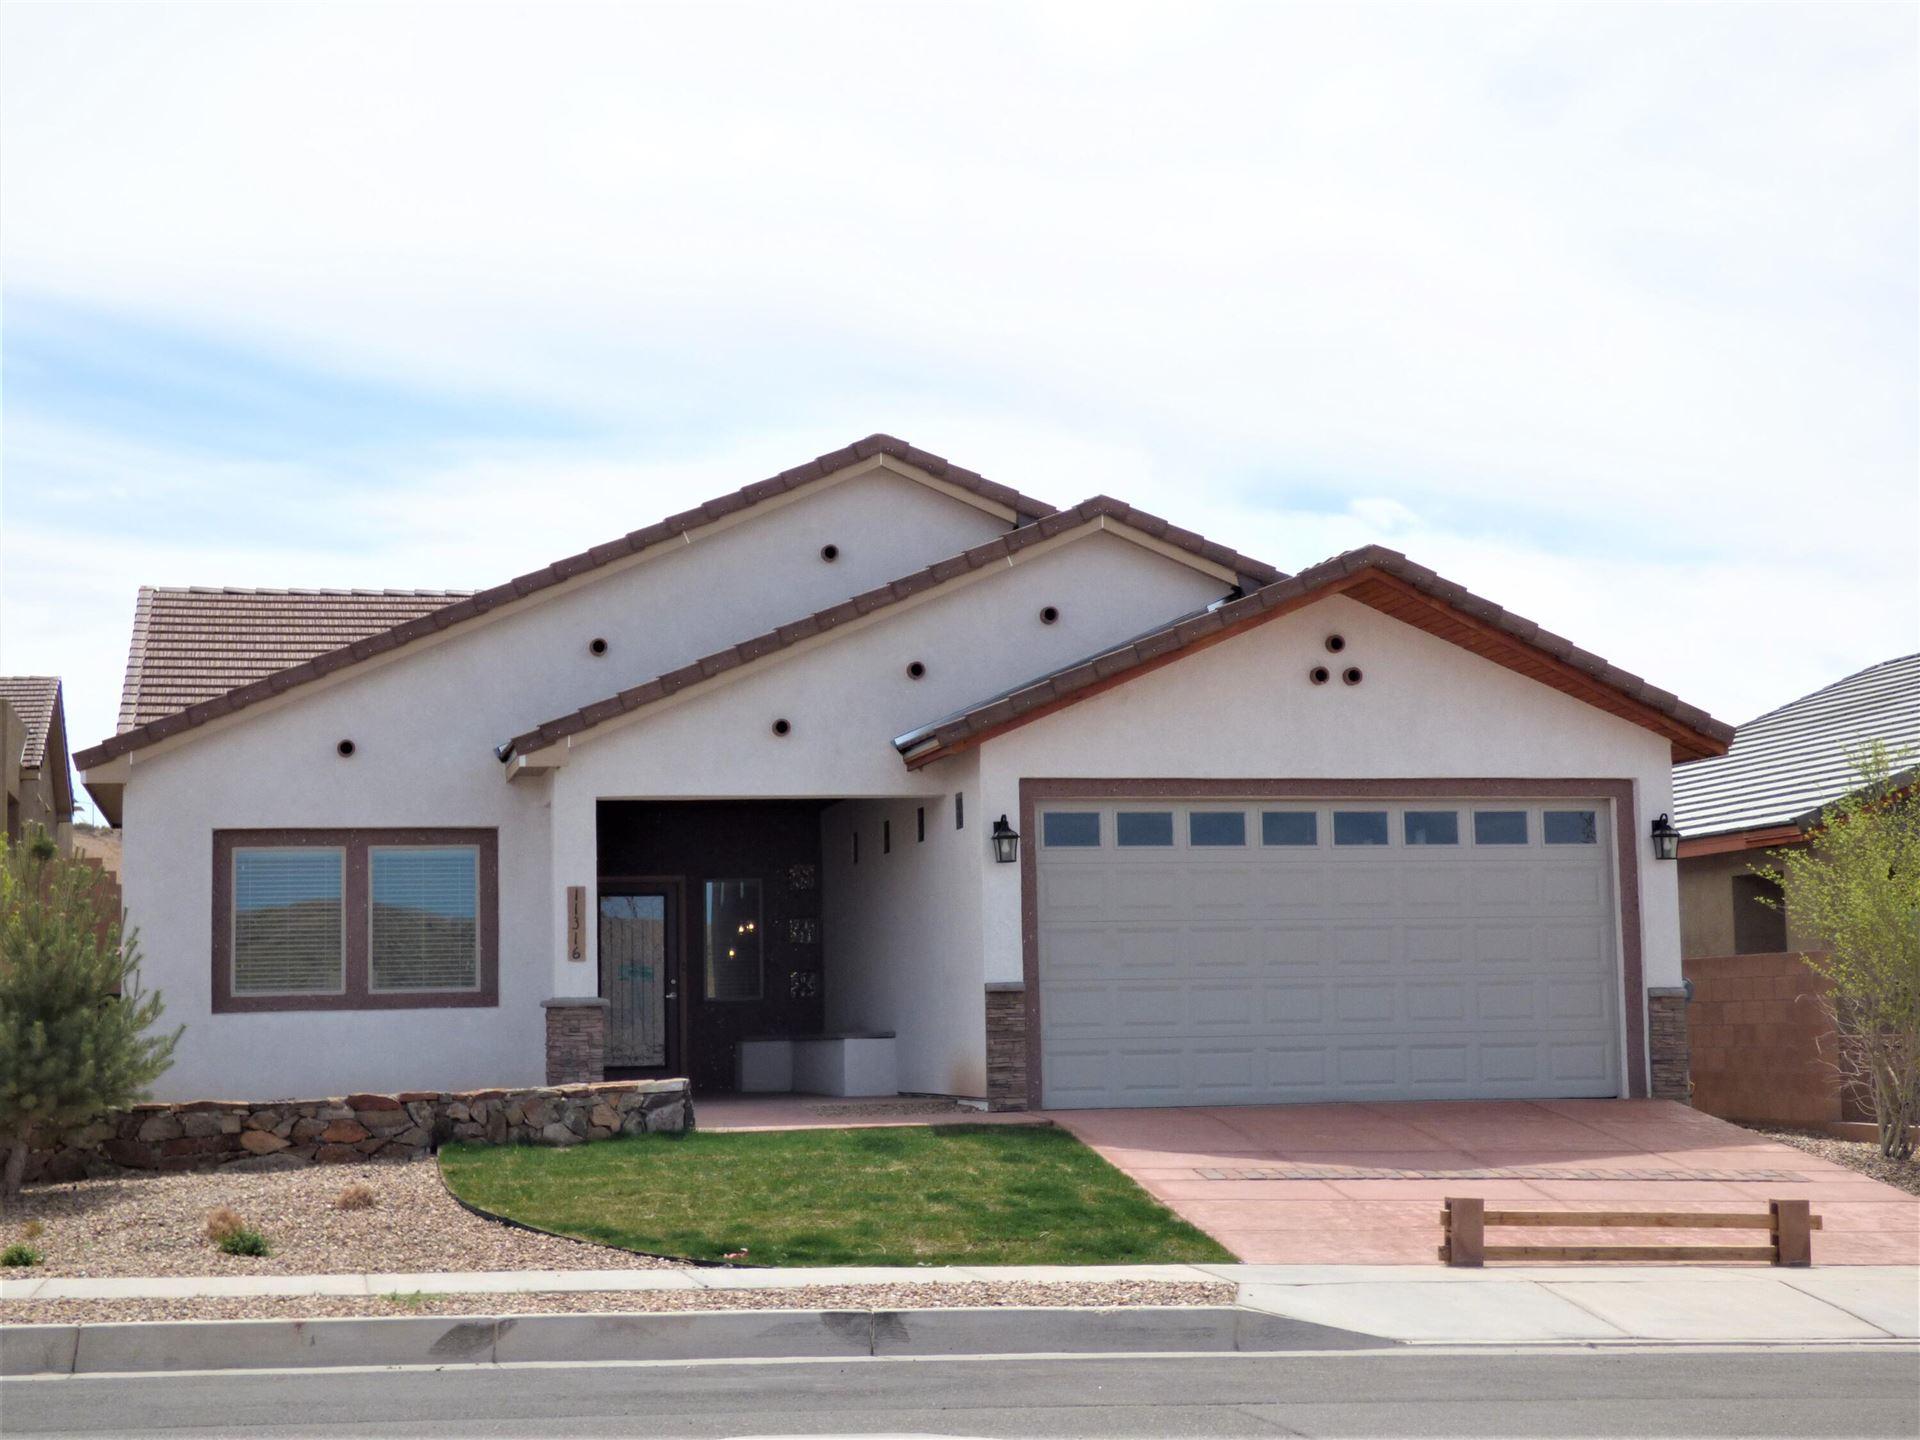 11316 MANZANO VISTA Avenue SE, Albuquerque, NM 87123 - MLS#: 990088